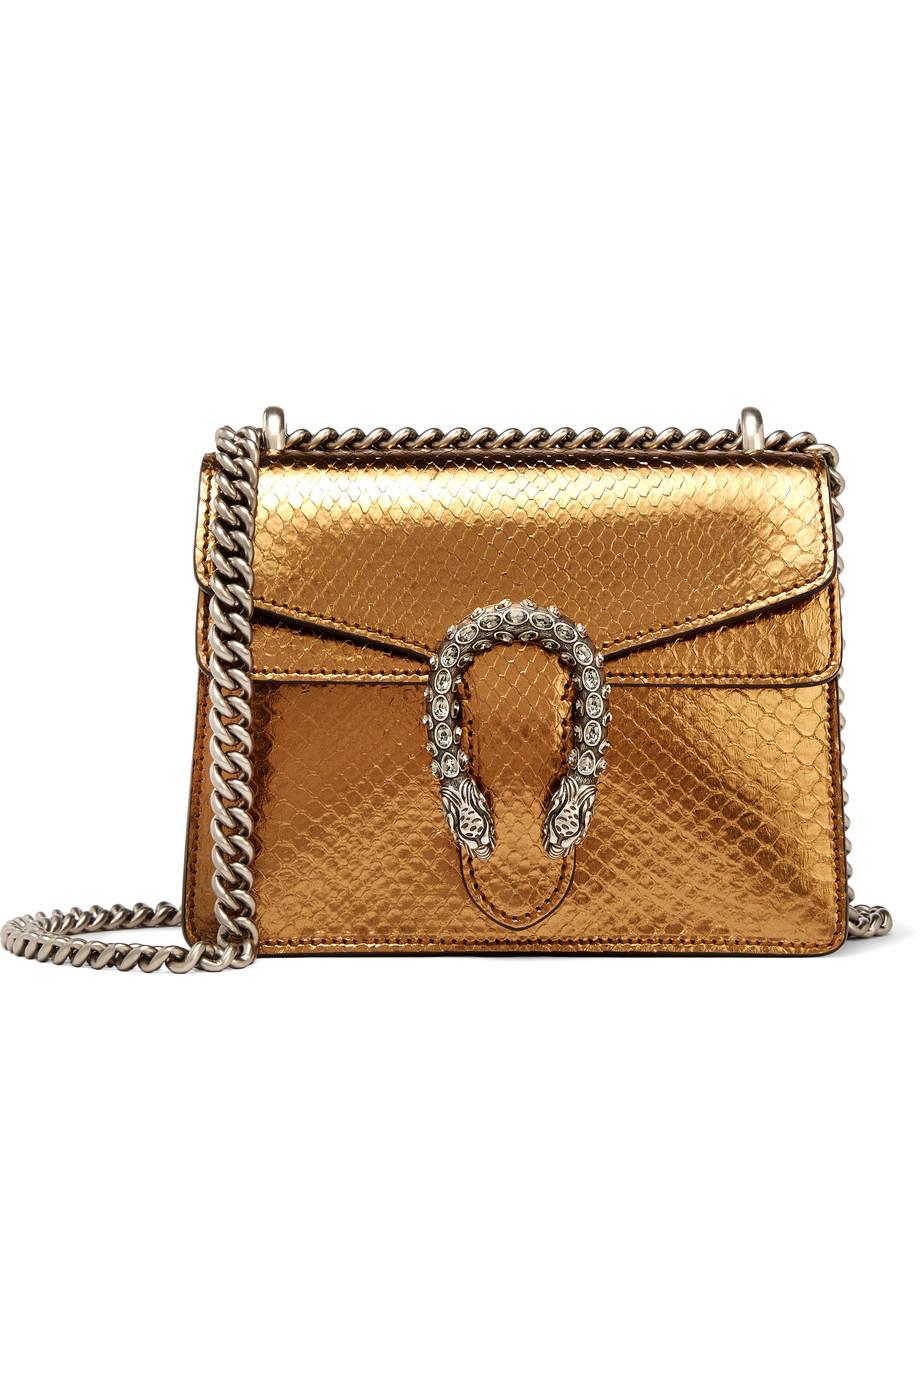 Gucci Dionysus Mini Metallic Python Shoulder Bag